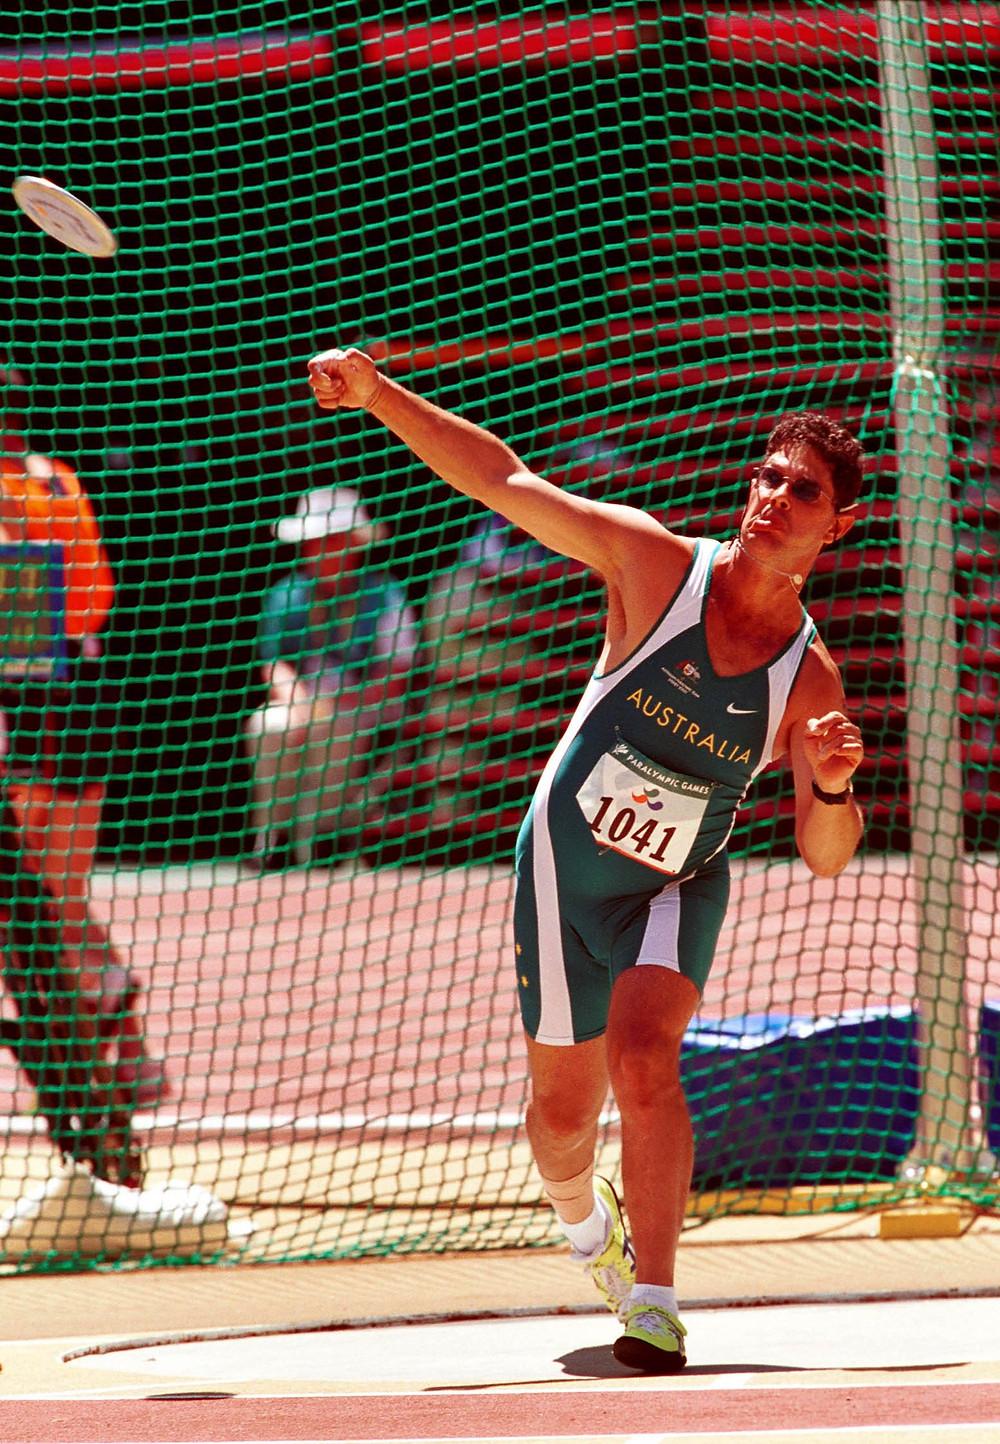 Disk atıcı Brian Harvey 2000 Sidney paralimpik oyunları, F38 müsabakasında / Foto: Australian Paralympic Committee / Wikimedia Commons